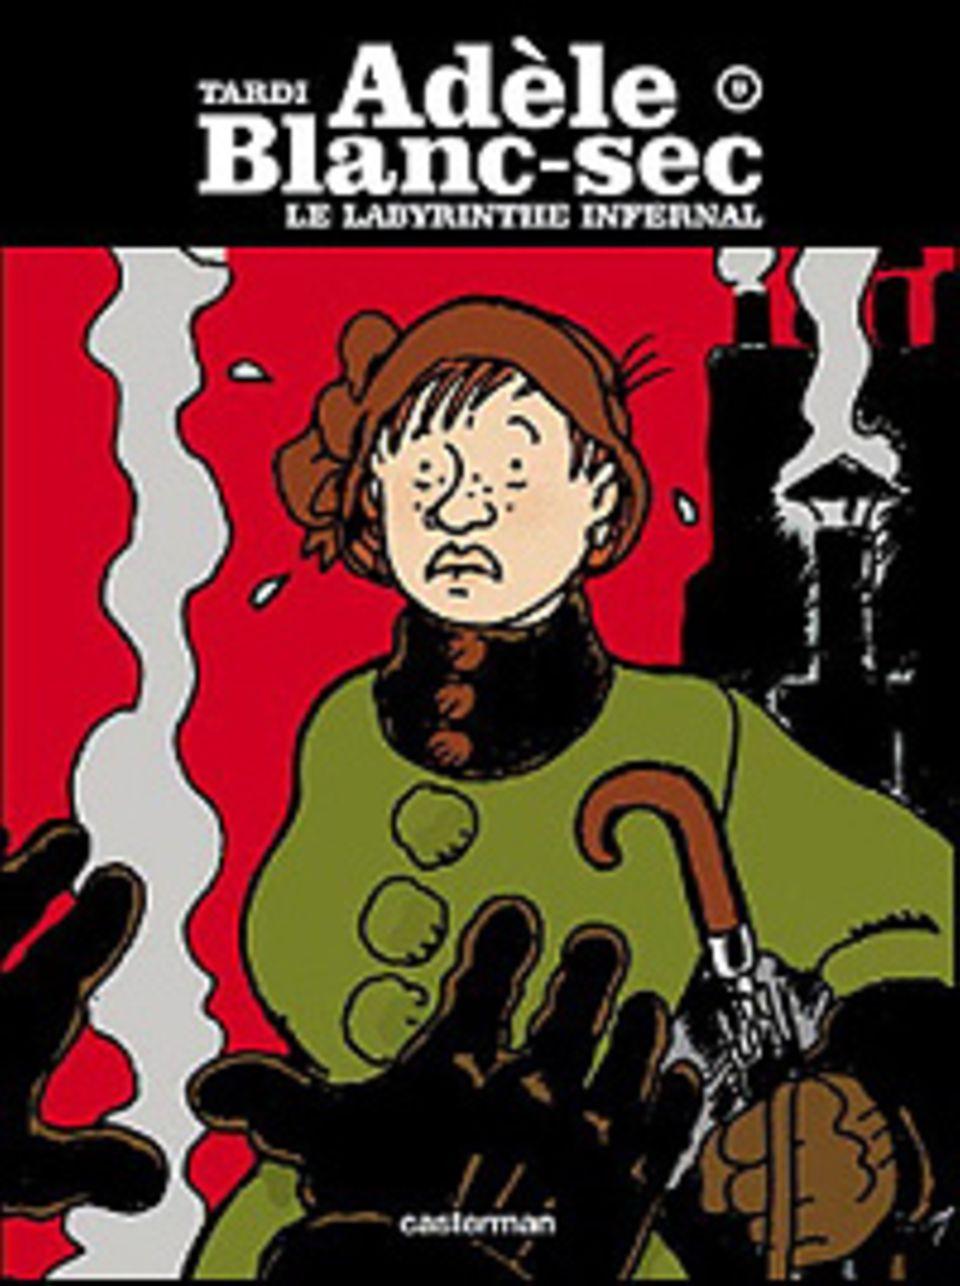 Buchtipps: Detektiv-Comics